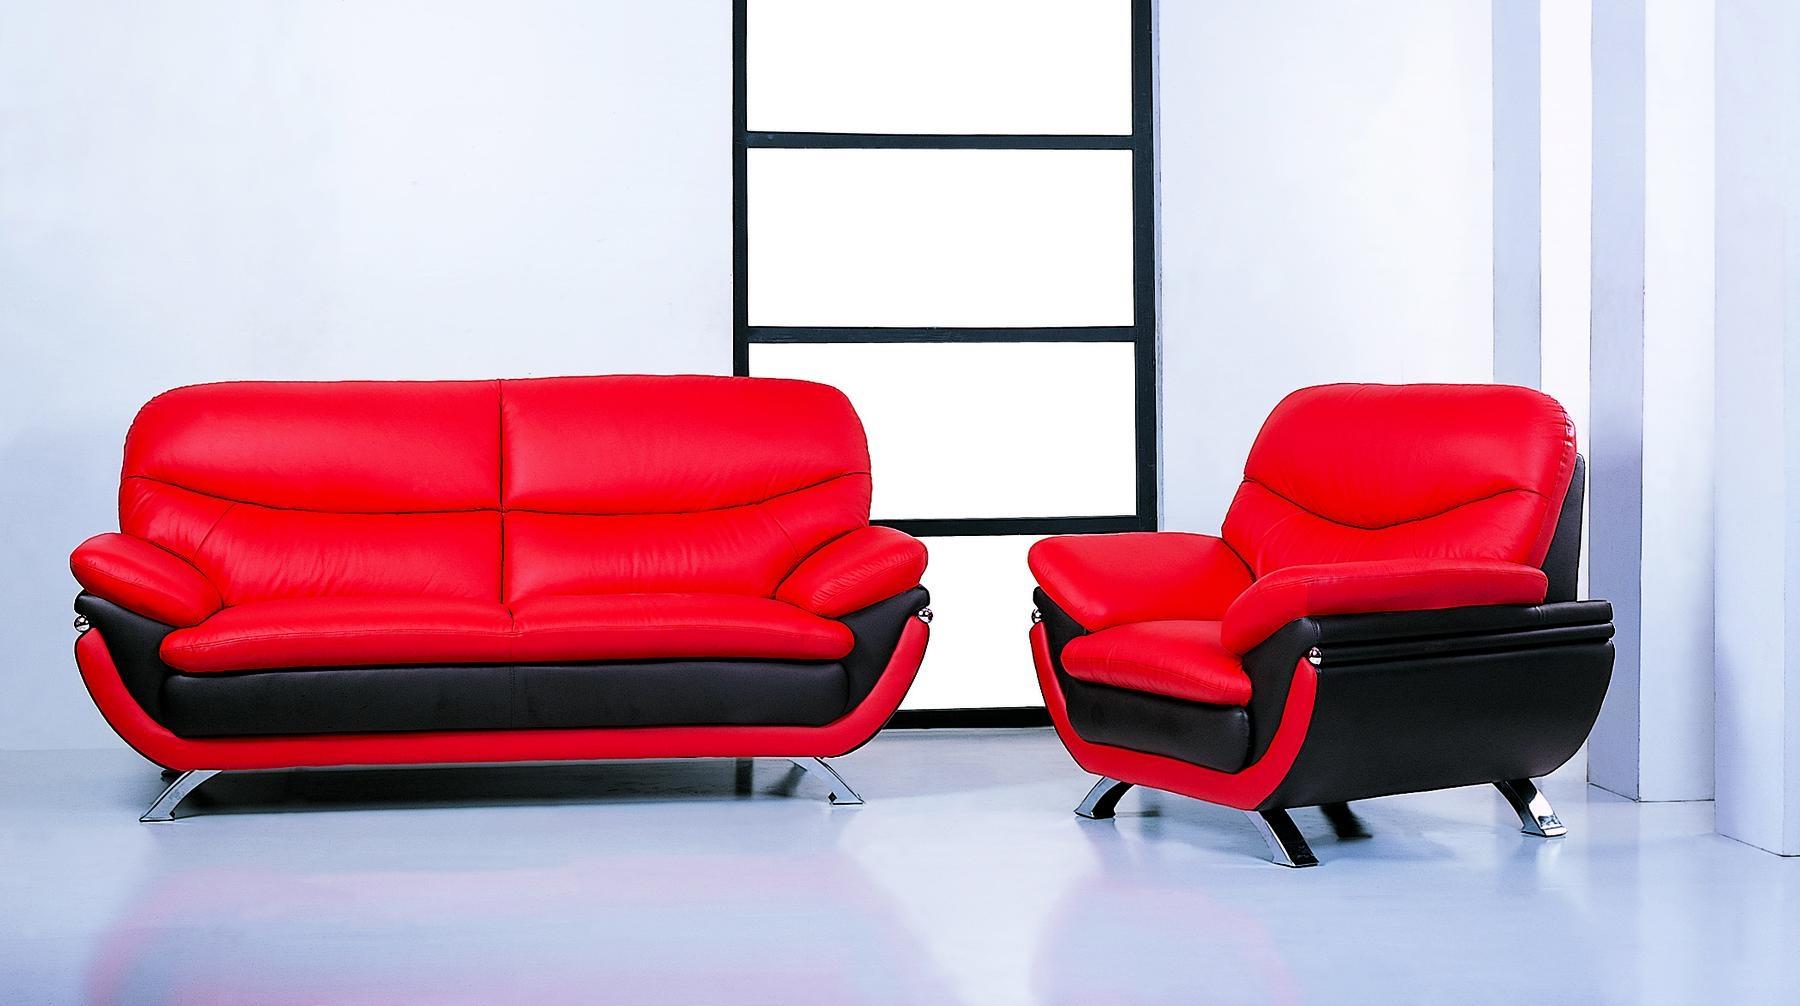 Jonus Red/black Sofa Jonus Beverly Hills Furniture Leather Sofas throughout Sofa Red And Black